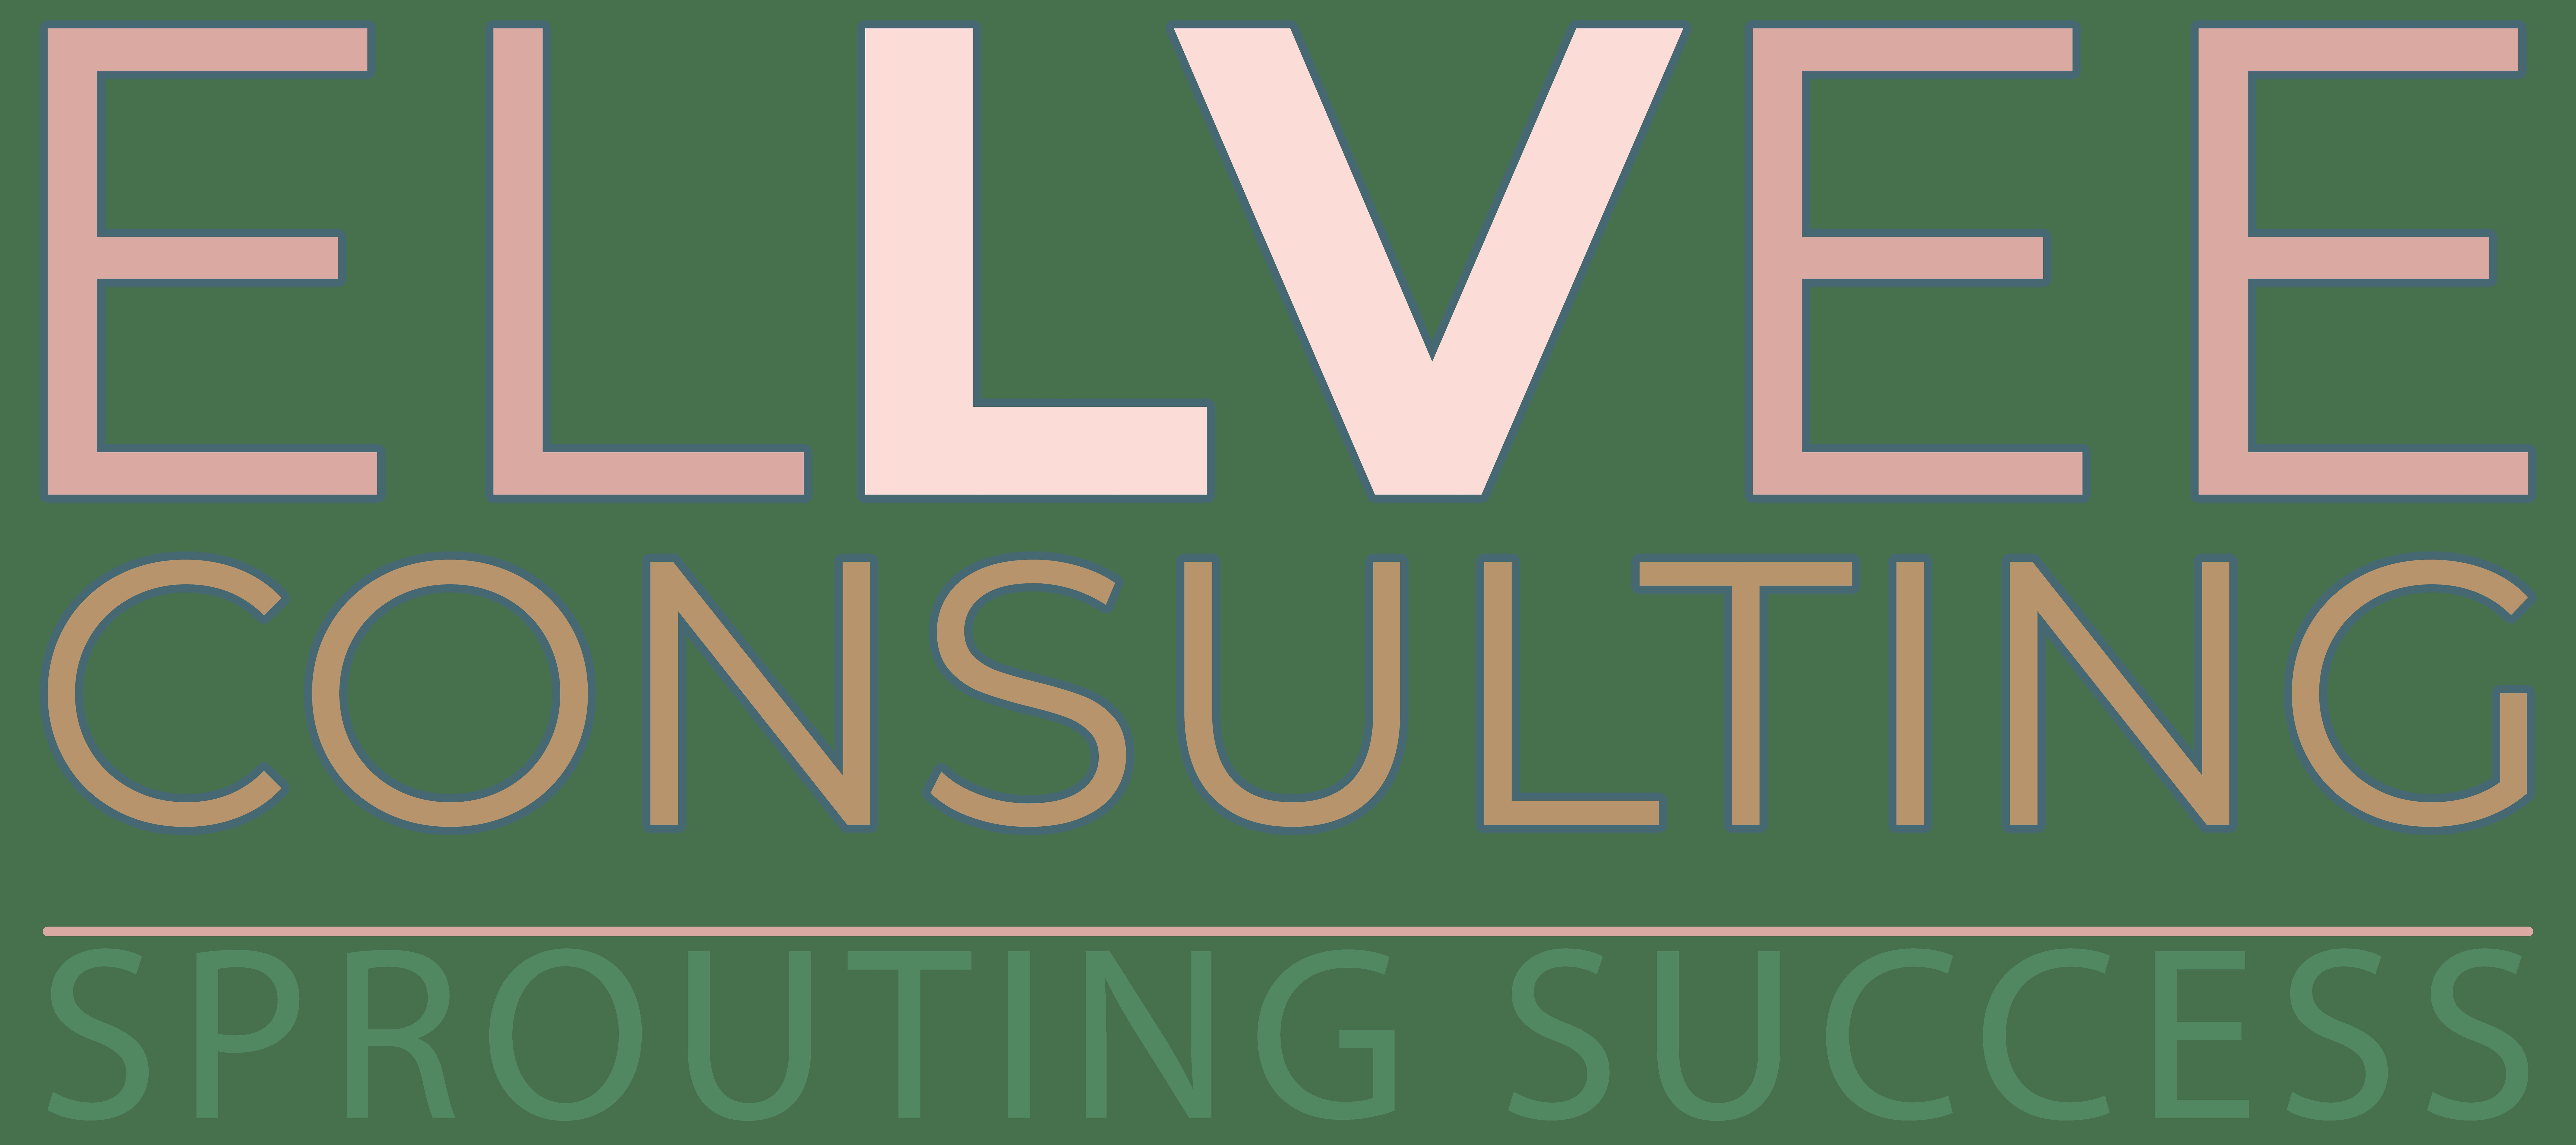 Ellvee Consulting Logo with Tagline